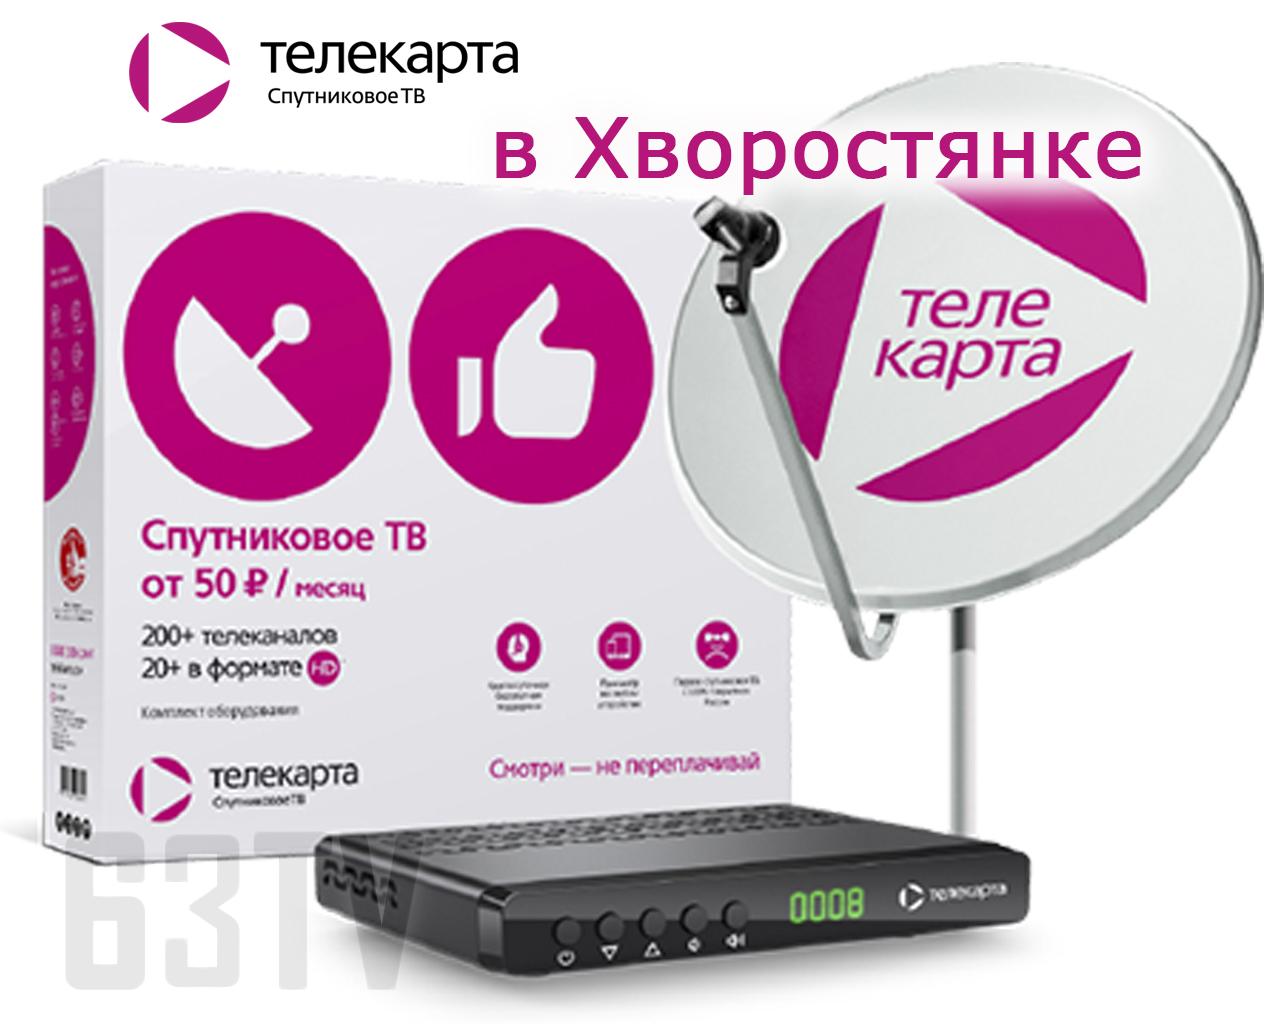 Телекарта ТВ в Хворостянке